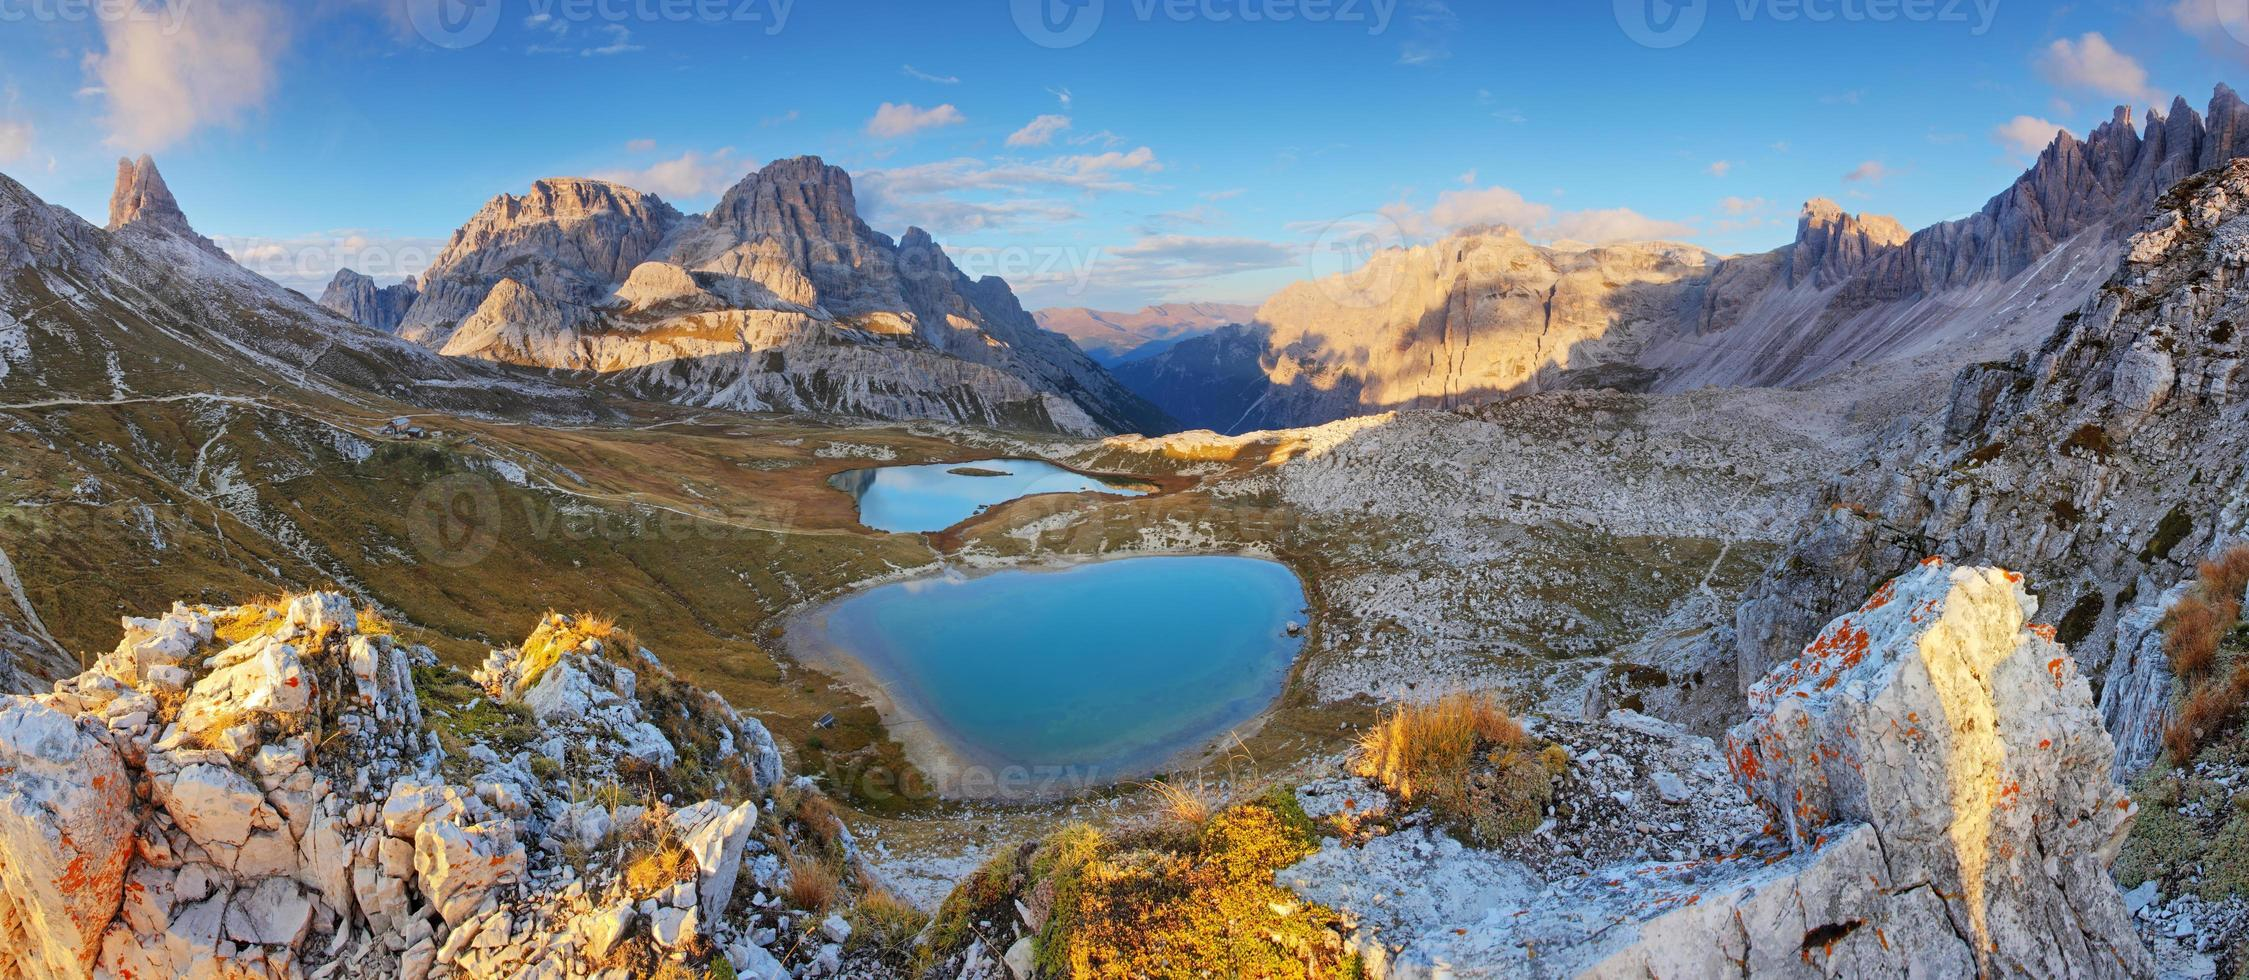 Lago dei Piani - Berg Italien Dolomiti Panorama foto